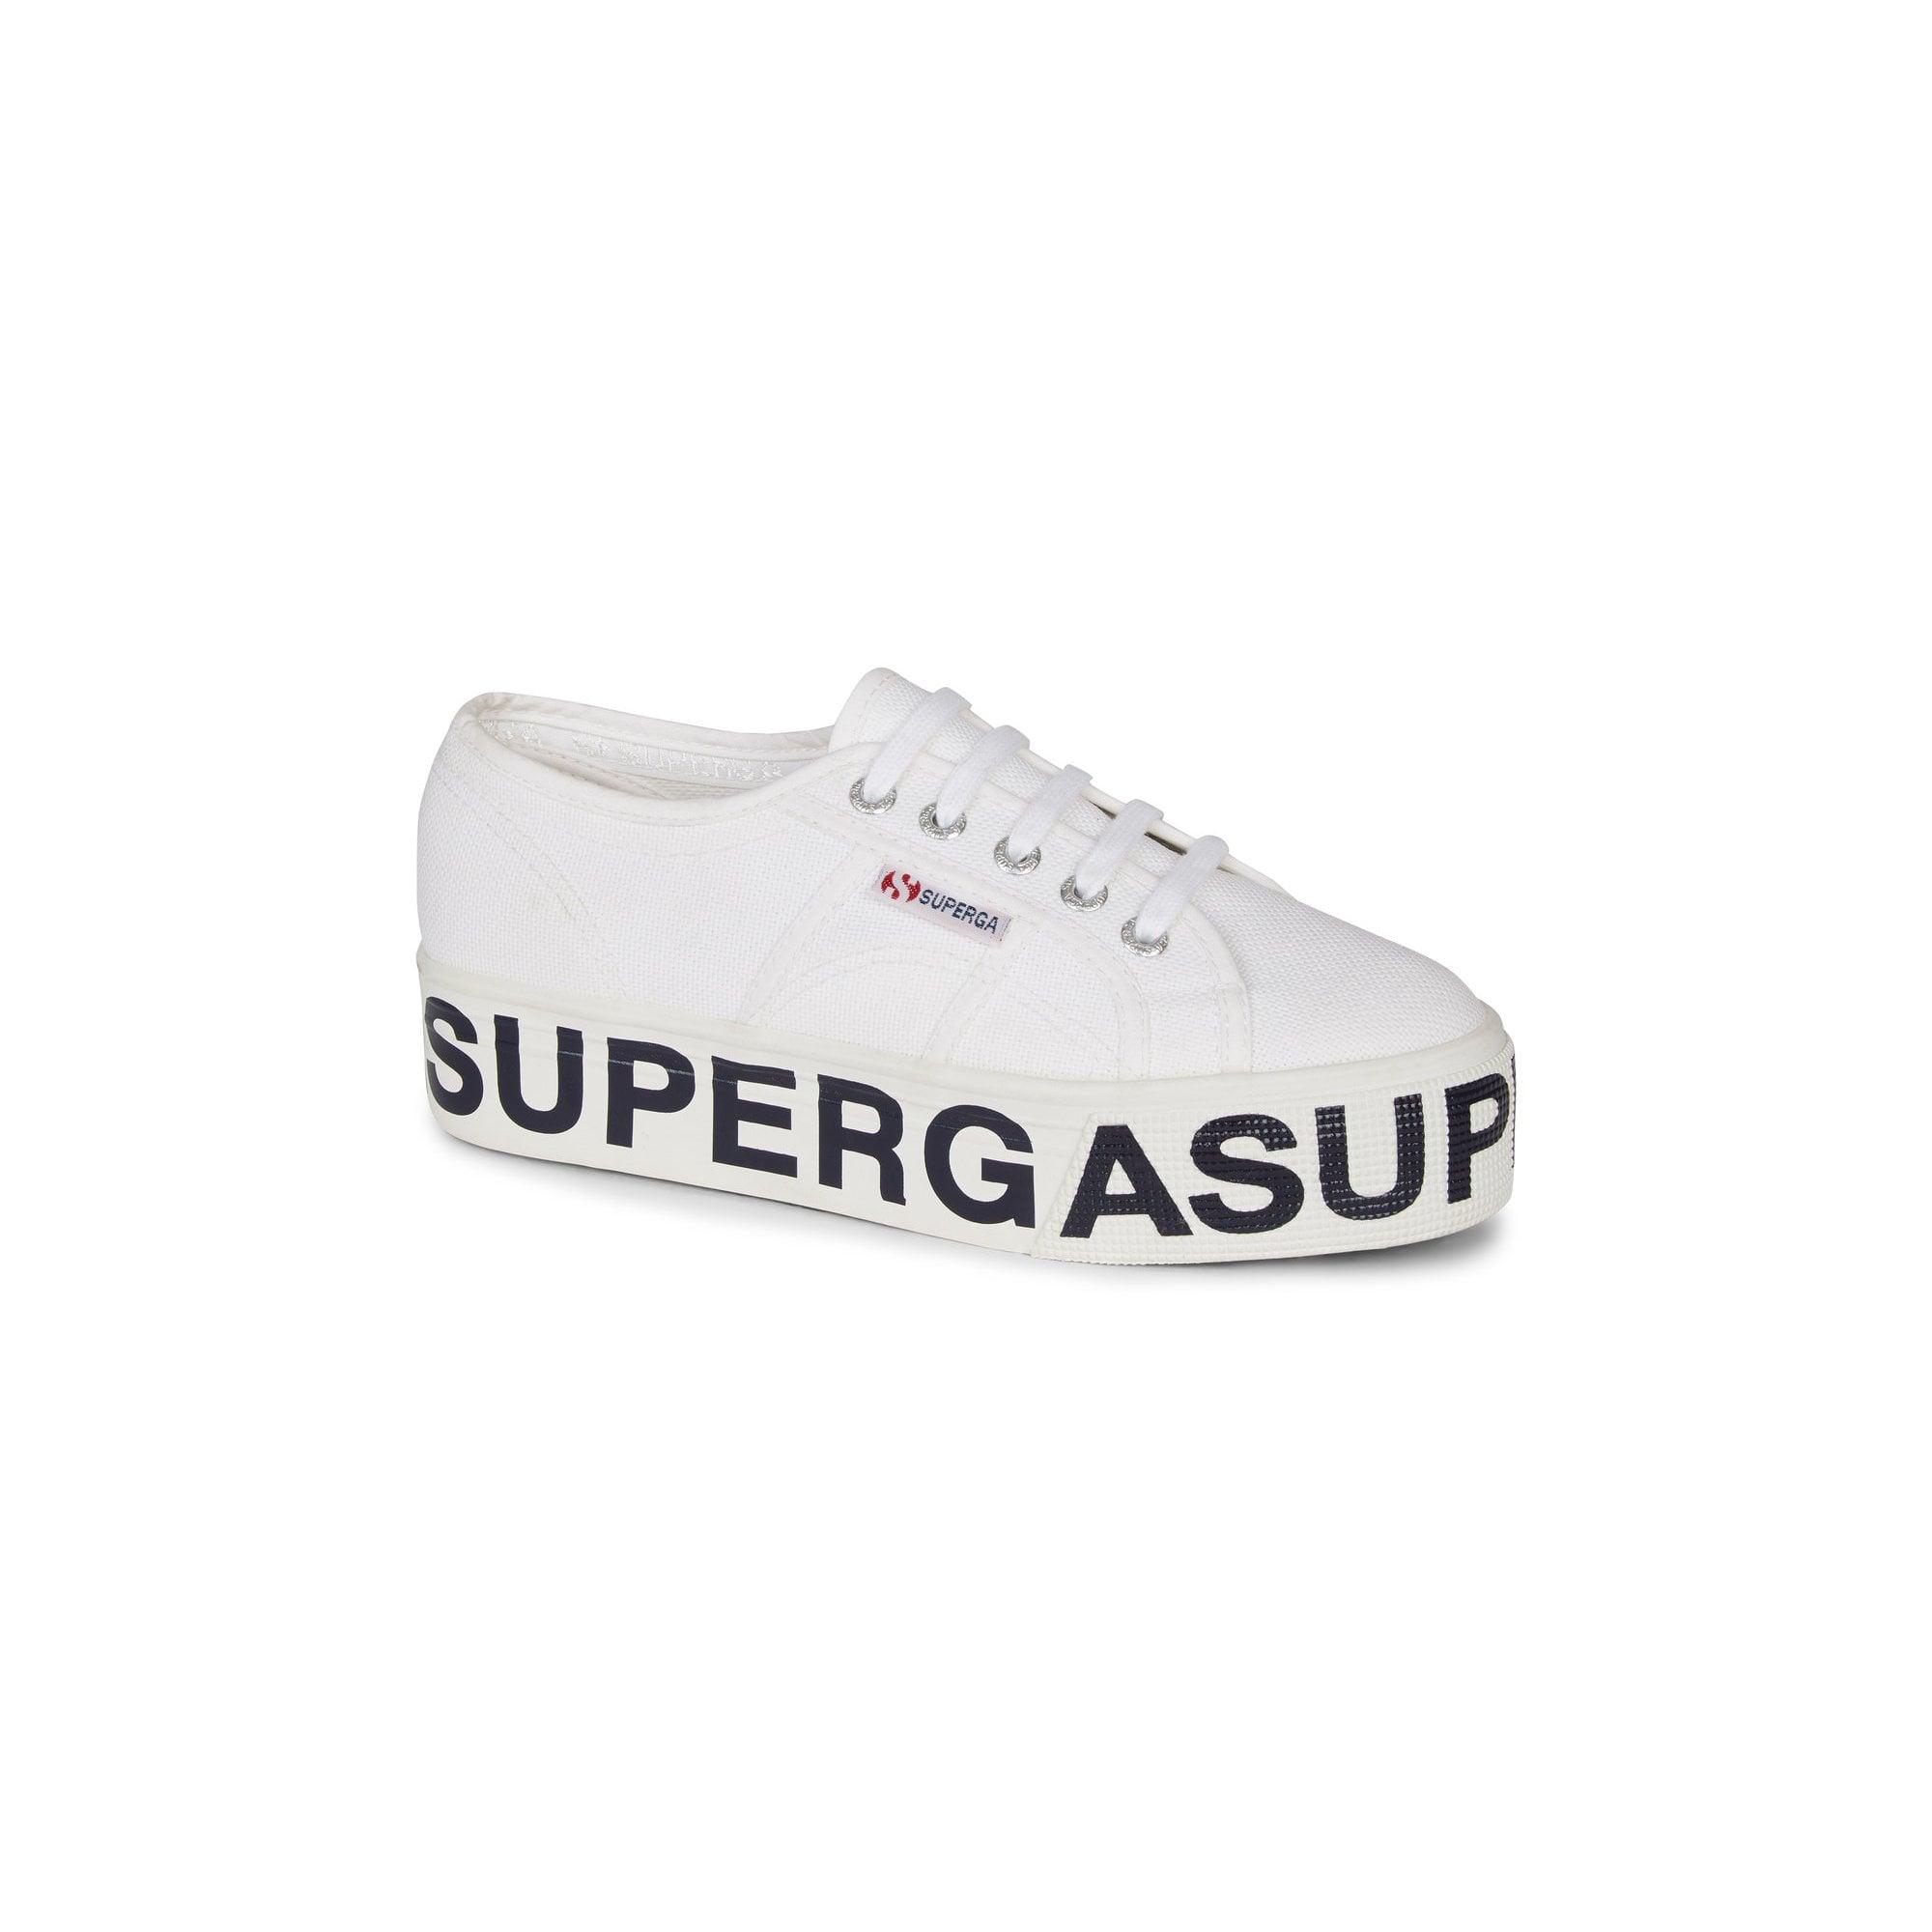 2790 Logo Flatform Sneakers in White